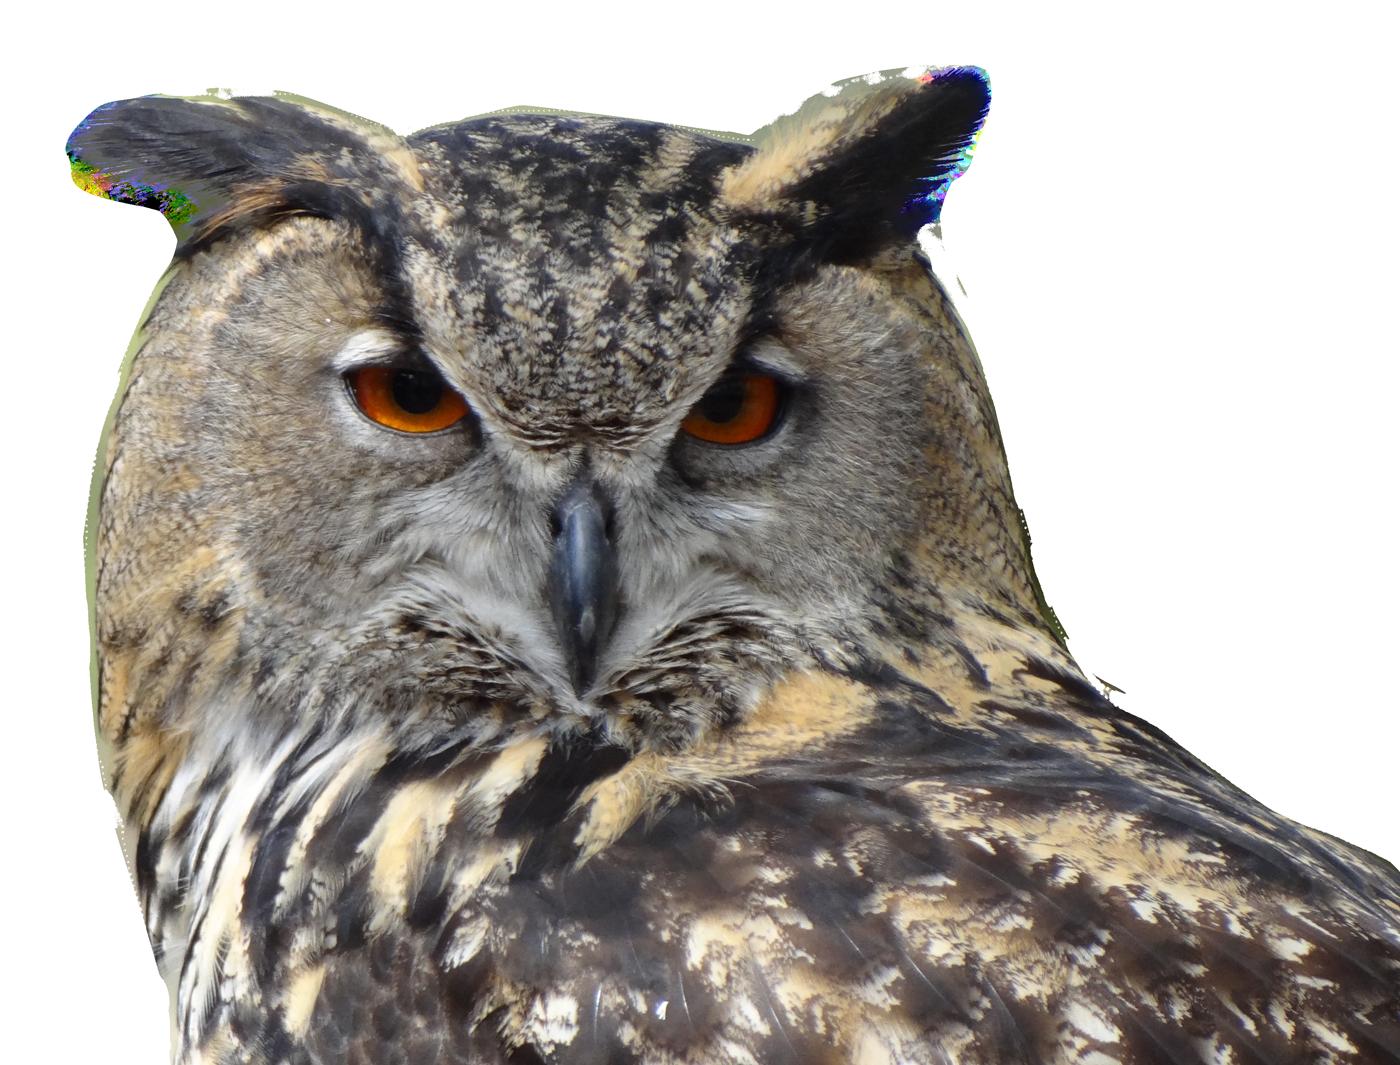 Clipart owl high resolution. Bird png image purepng